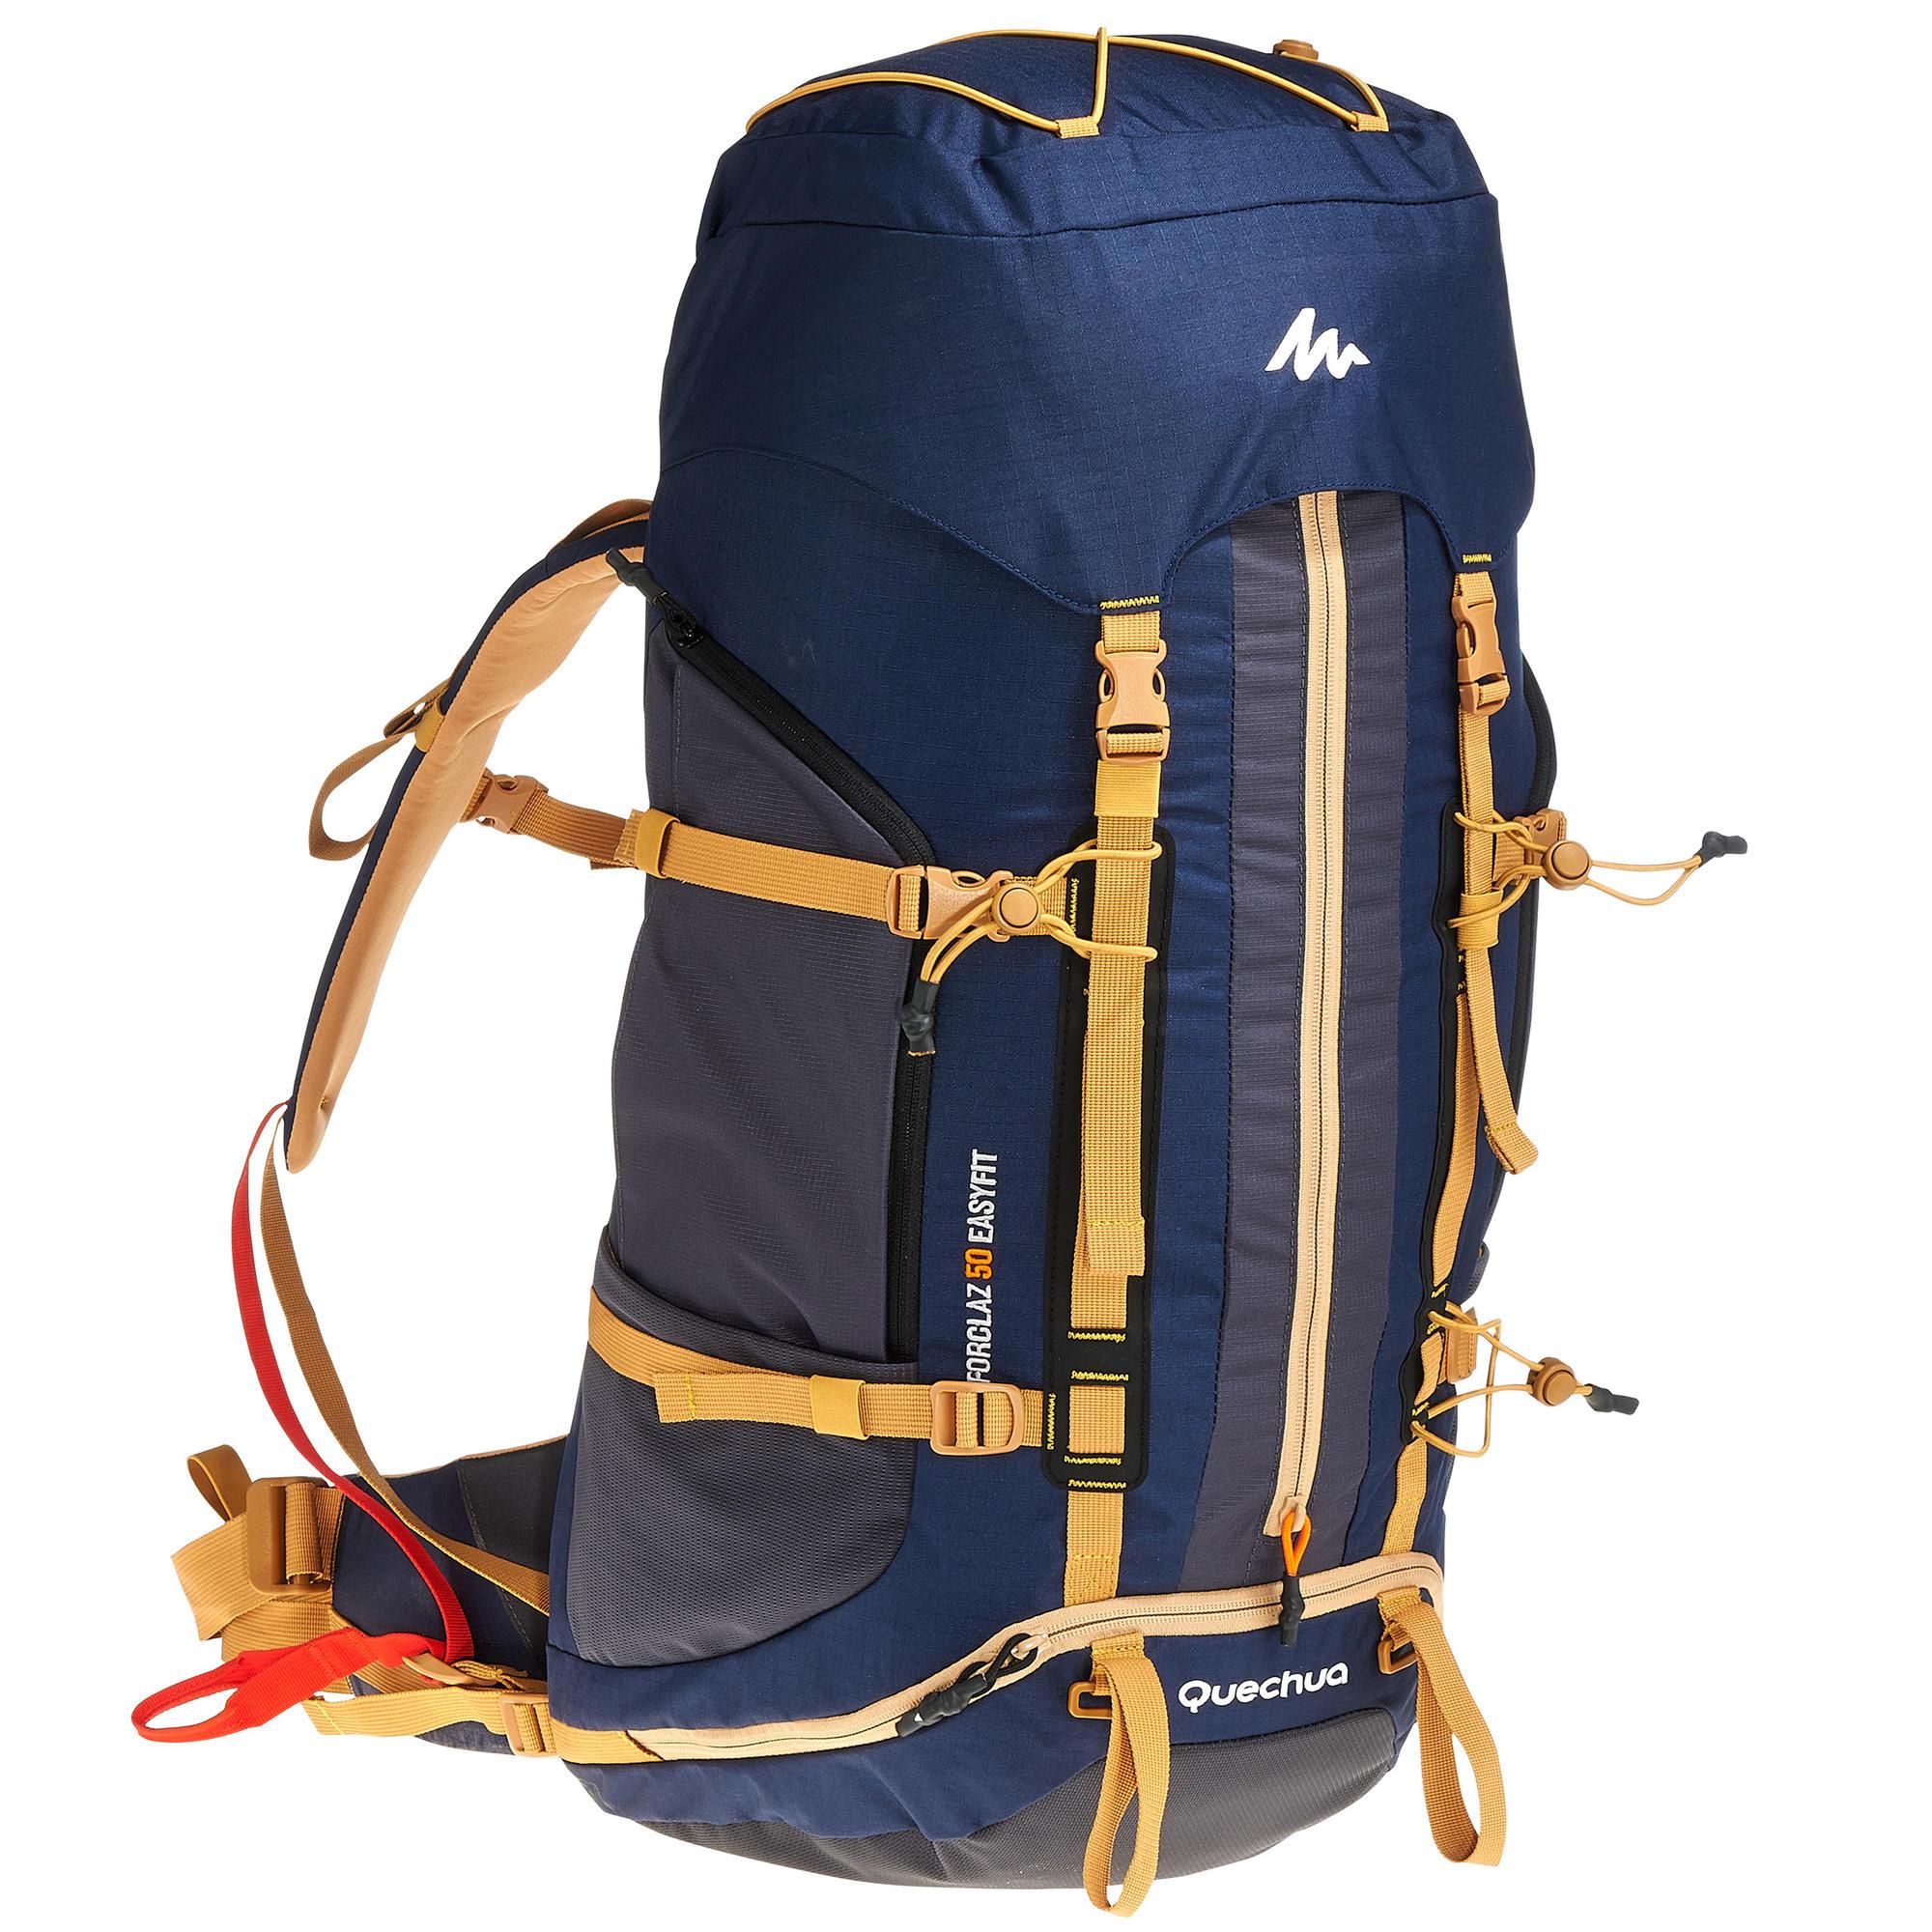 sac dos trekking easyfit homme 50 litres bleu quechua. Black Bedroom Furniture Sets. Home Design Ideas